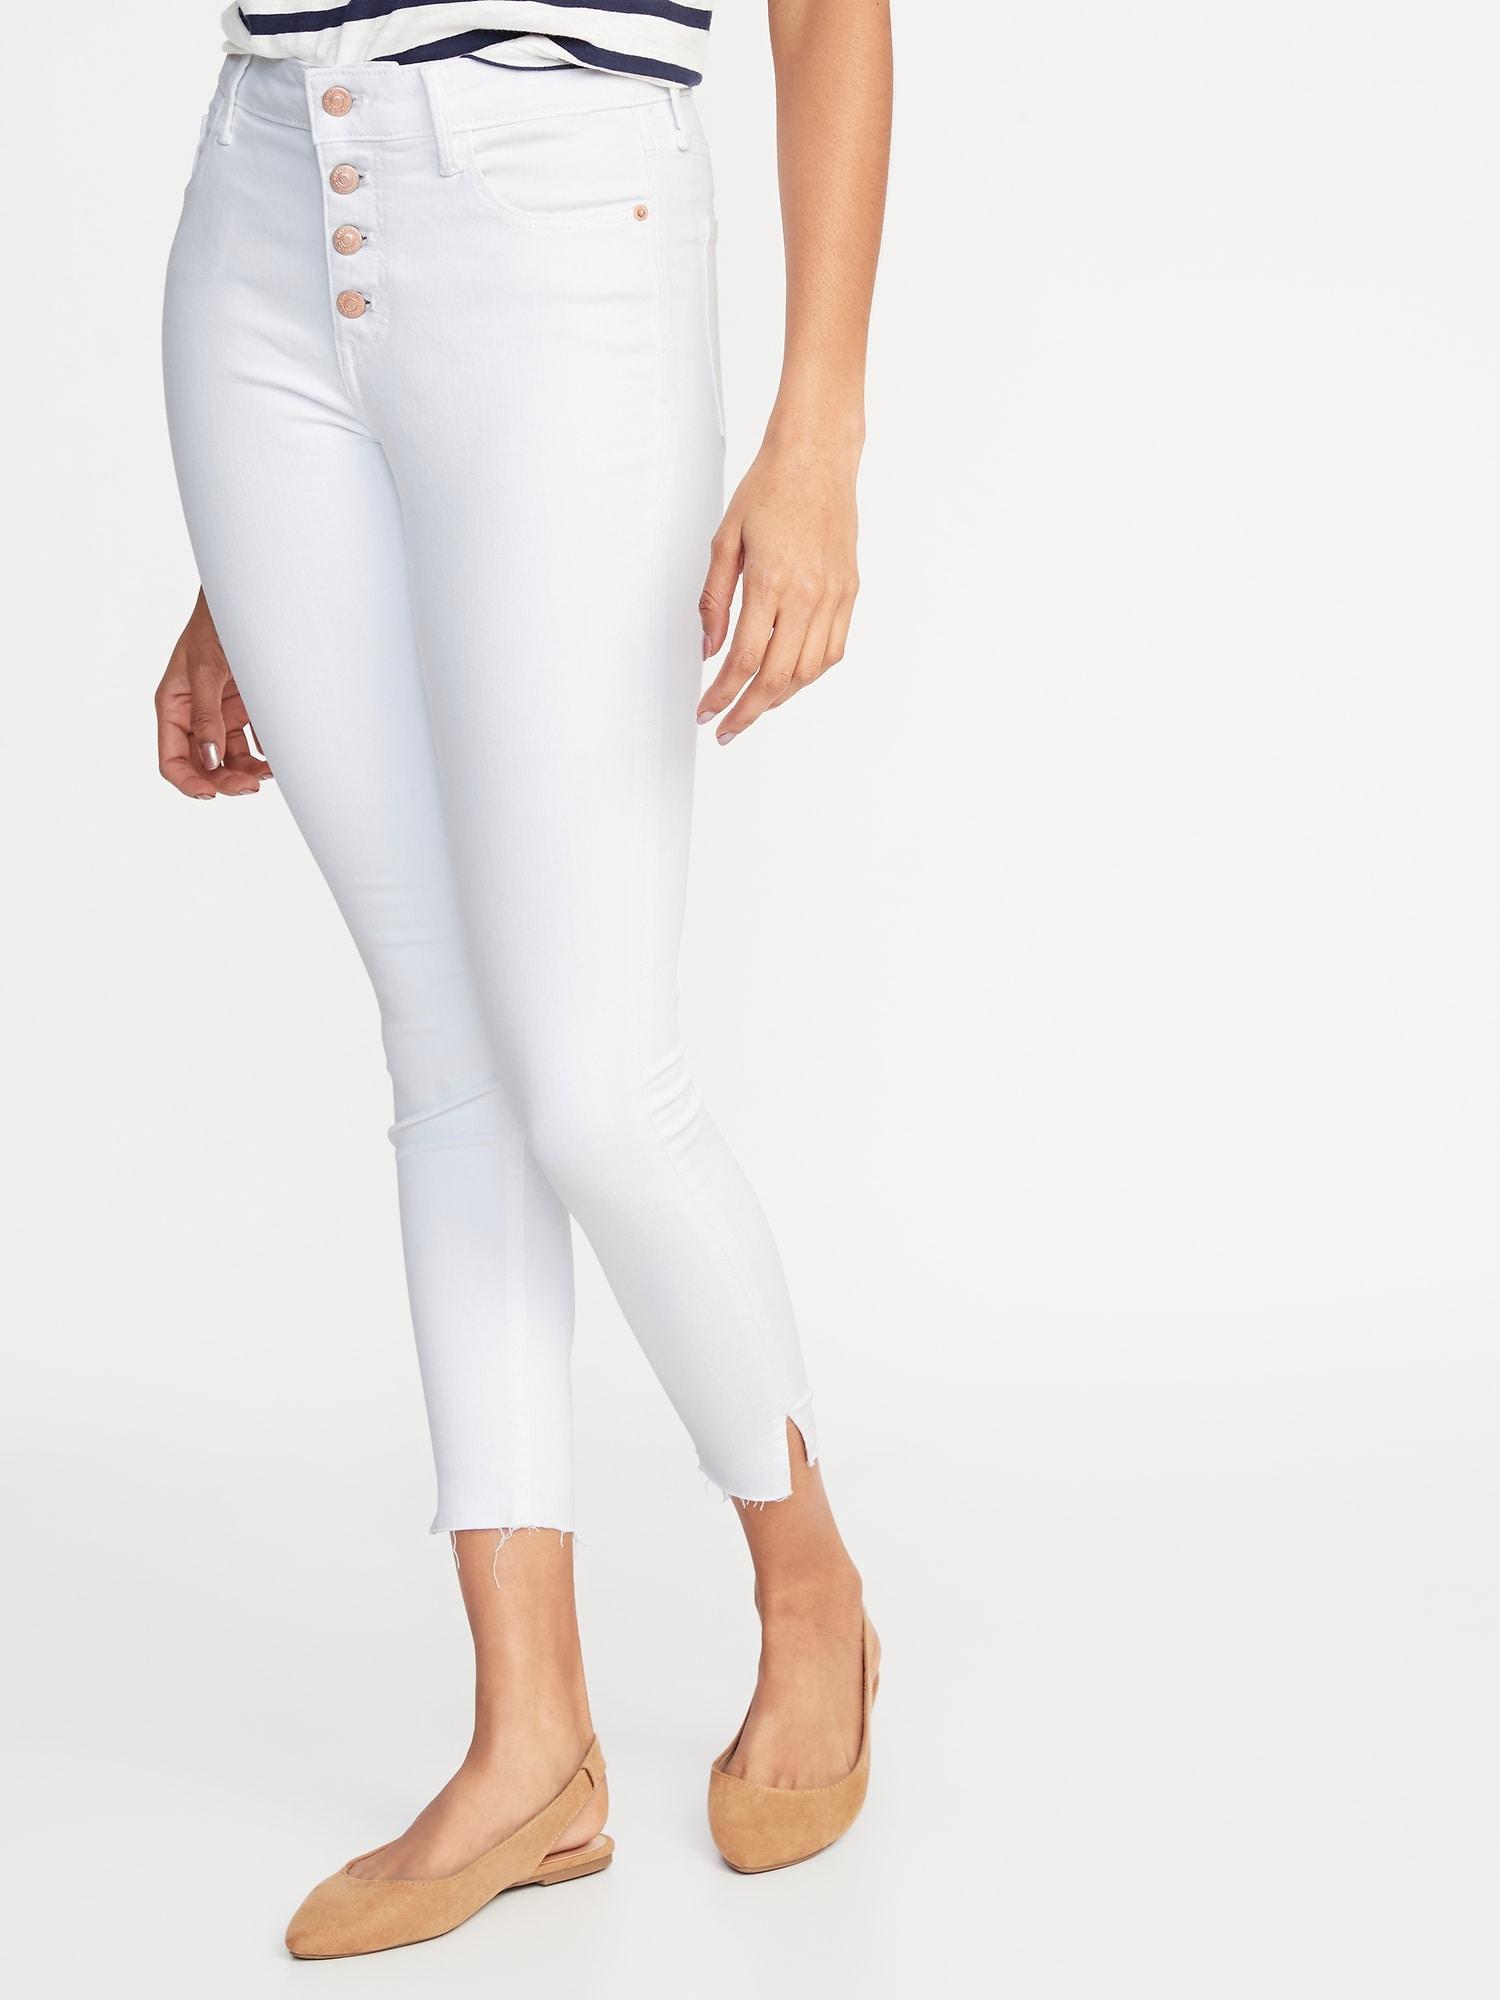 ddde8f2e3c11 High-Rise Secret-Slim Pockets Button-Fly Rockstar Raw-Edge Ankle Jeans for  Women